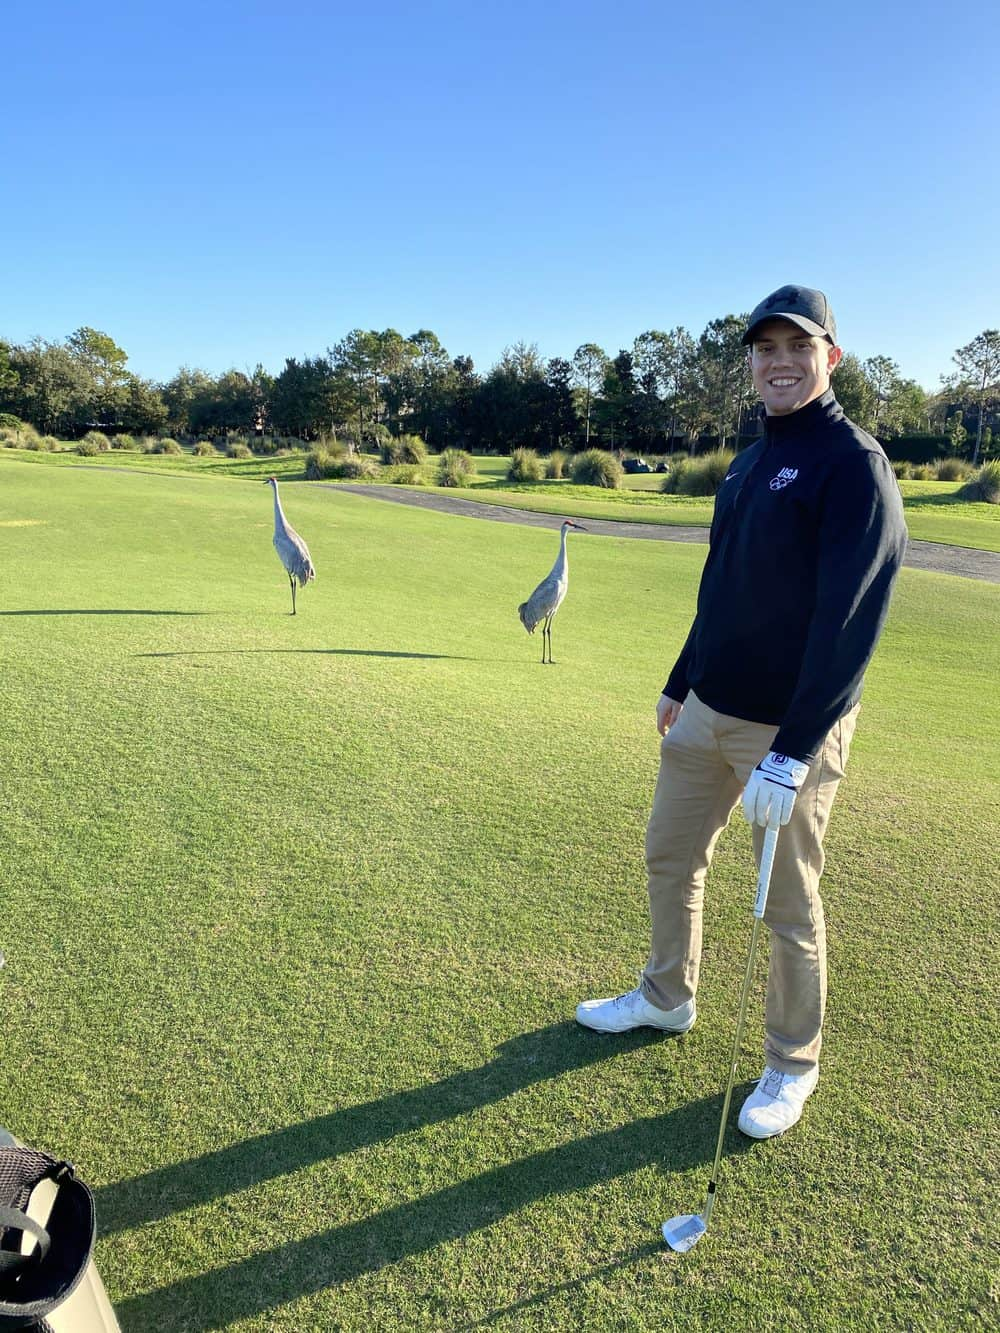 Brandon Standing on Golf Course